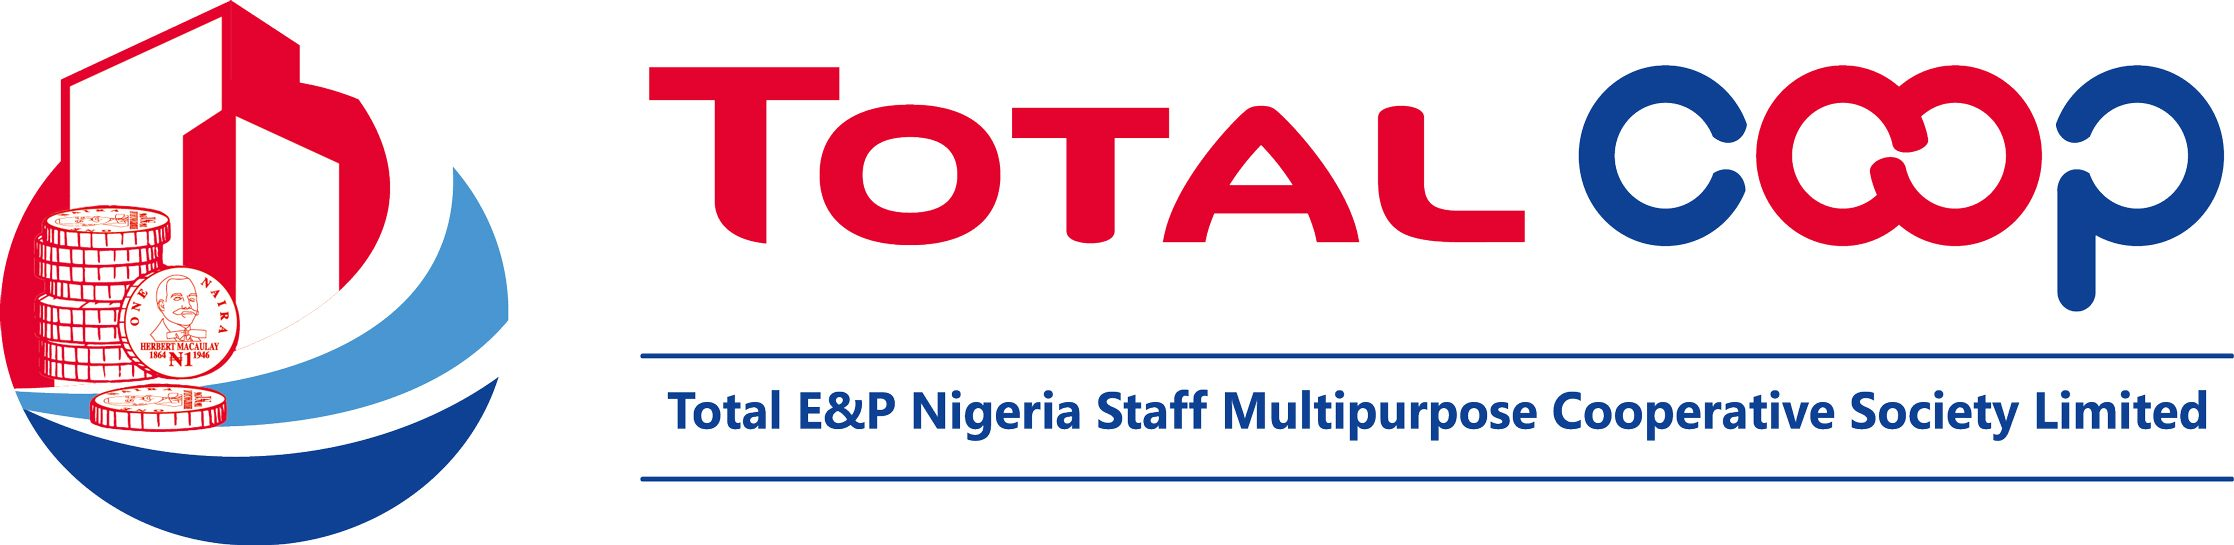 Total E&P Nigeria Cooperative